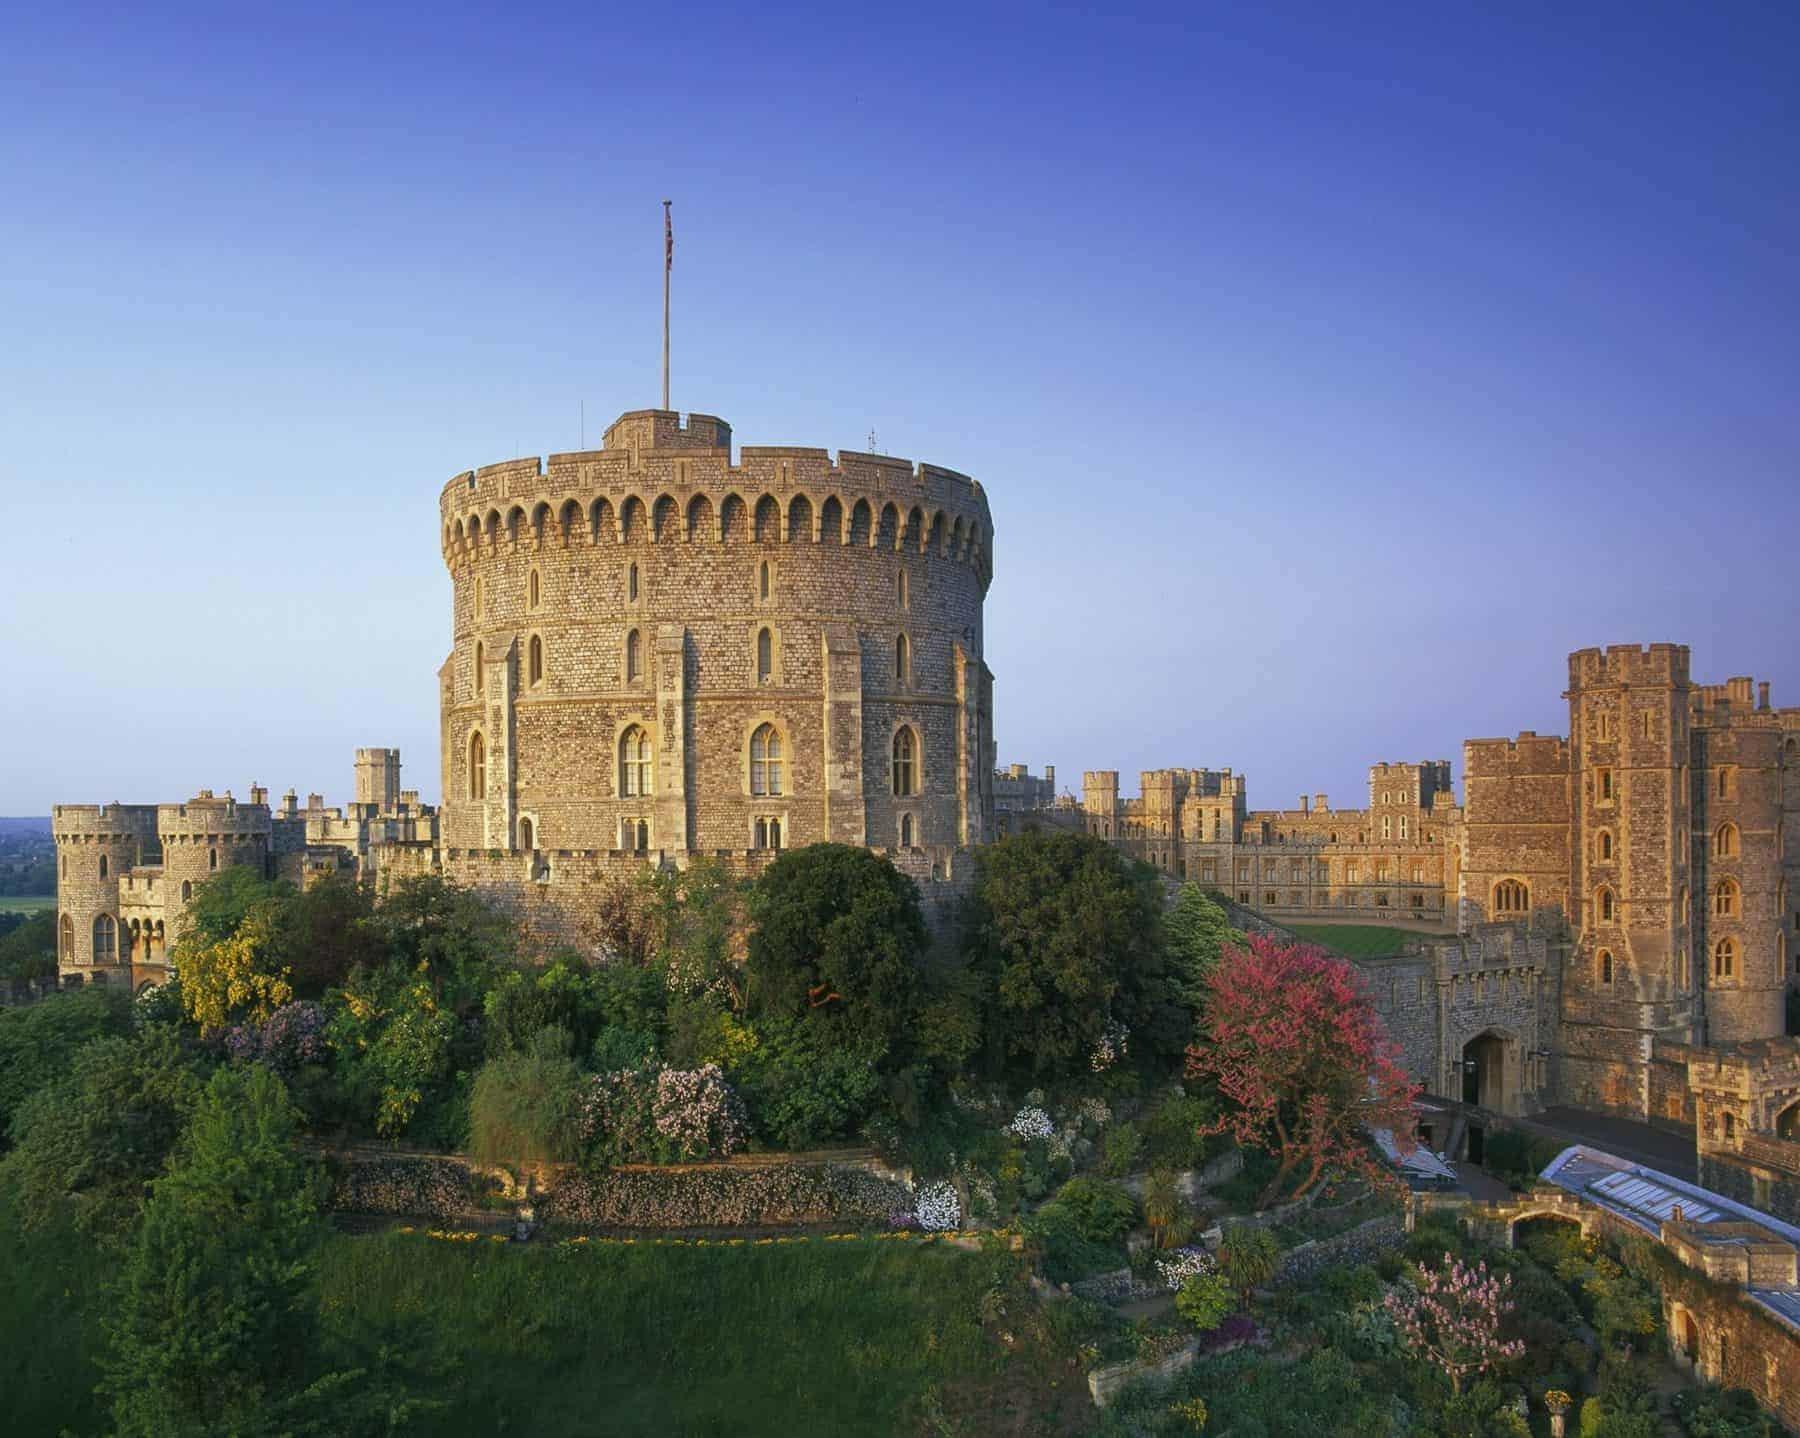 London, Windsor Castle Queen Elizabeth d. 2's weekend home